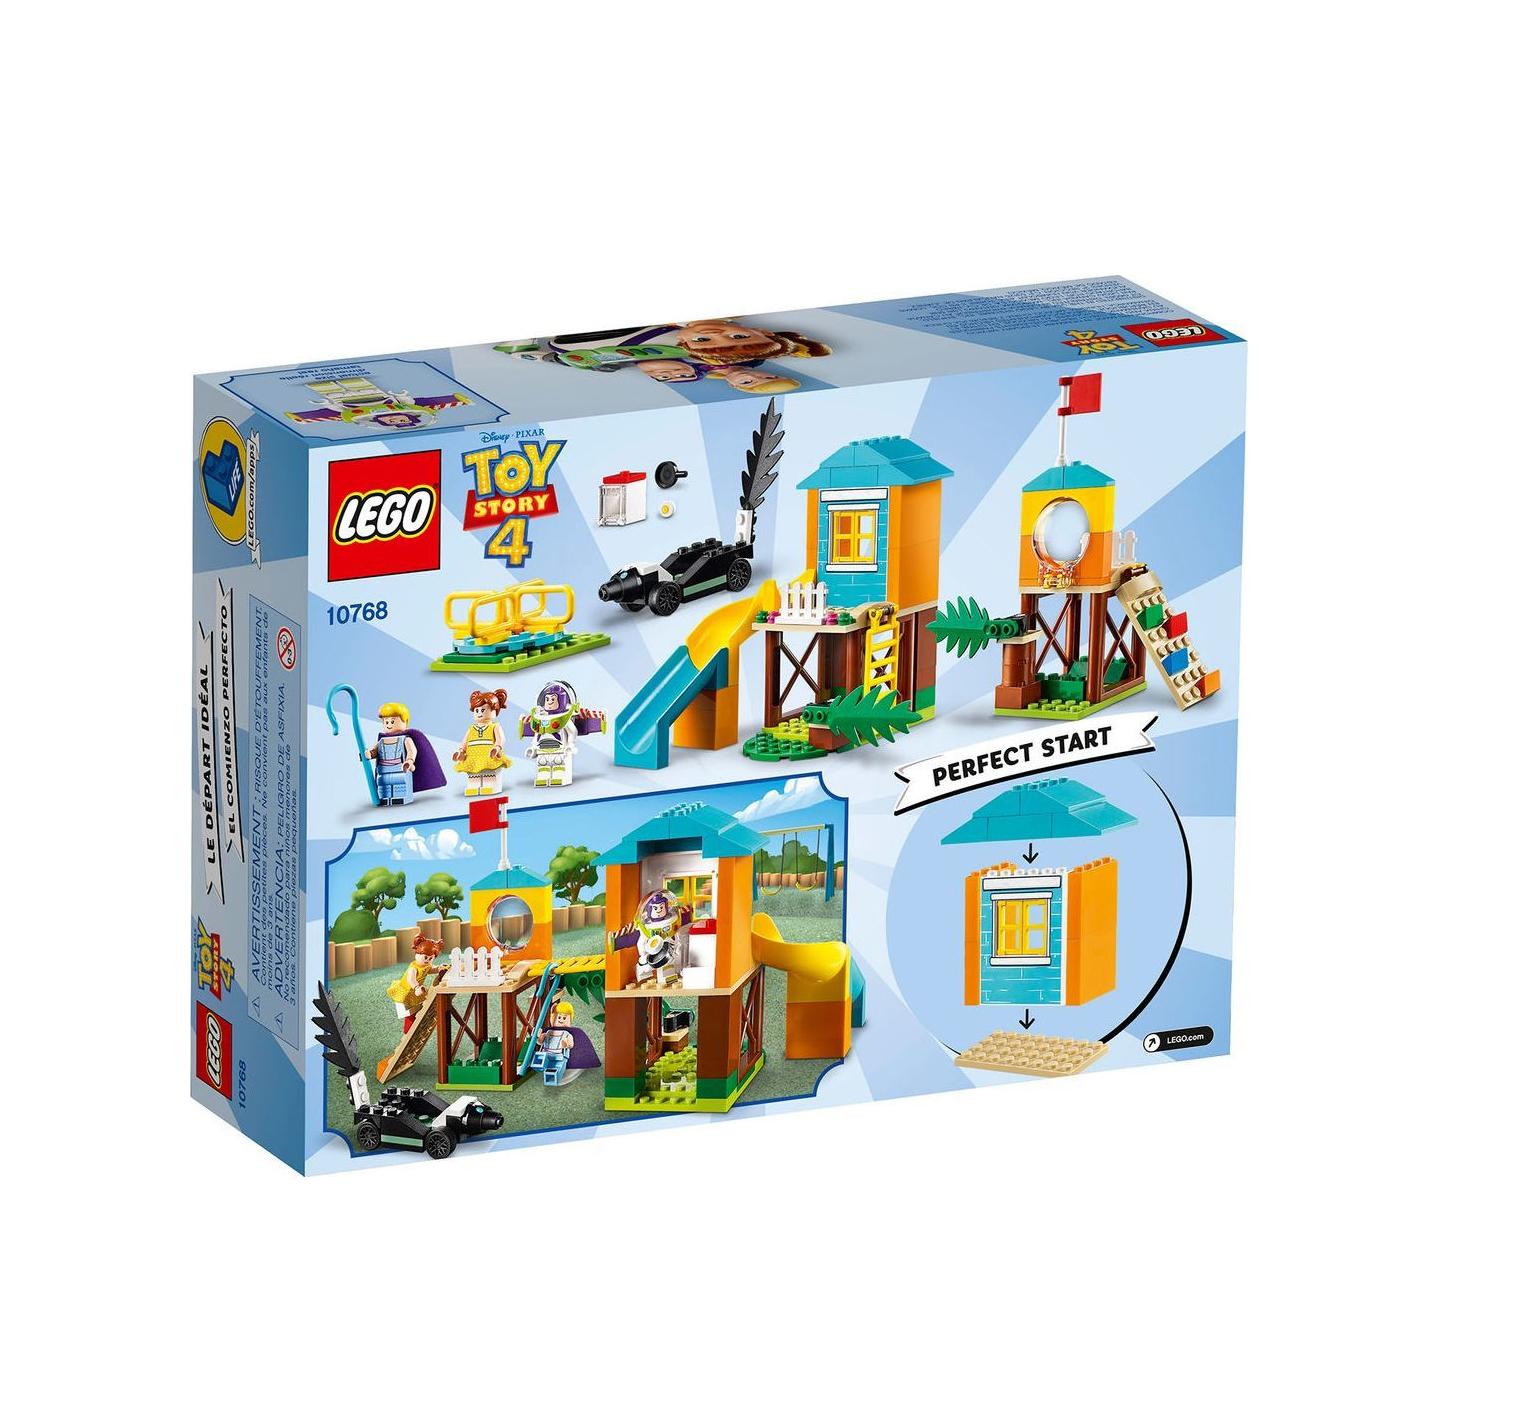 Lego Toy Story: Buzz & Bo Peep's Playground Adventure 10768